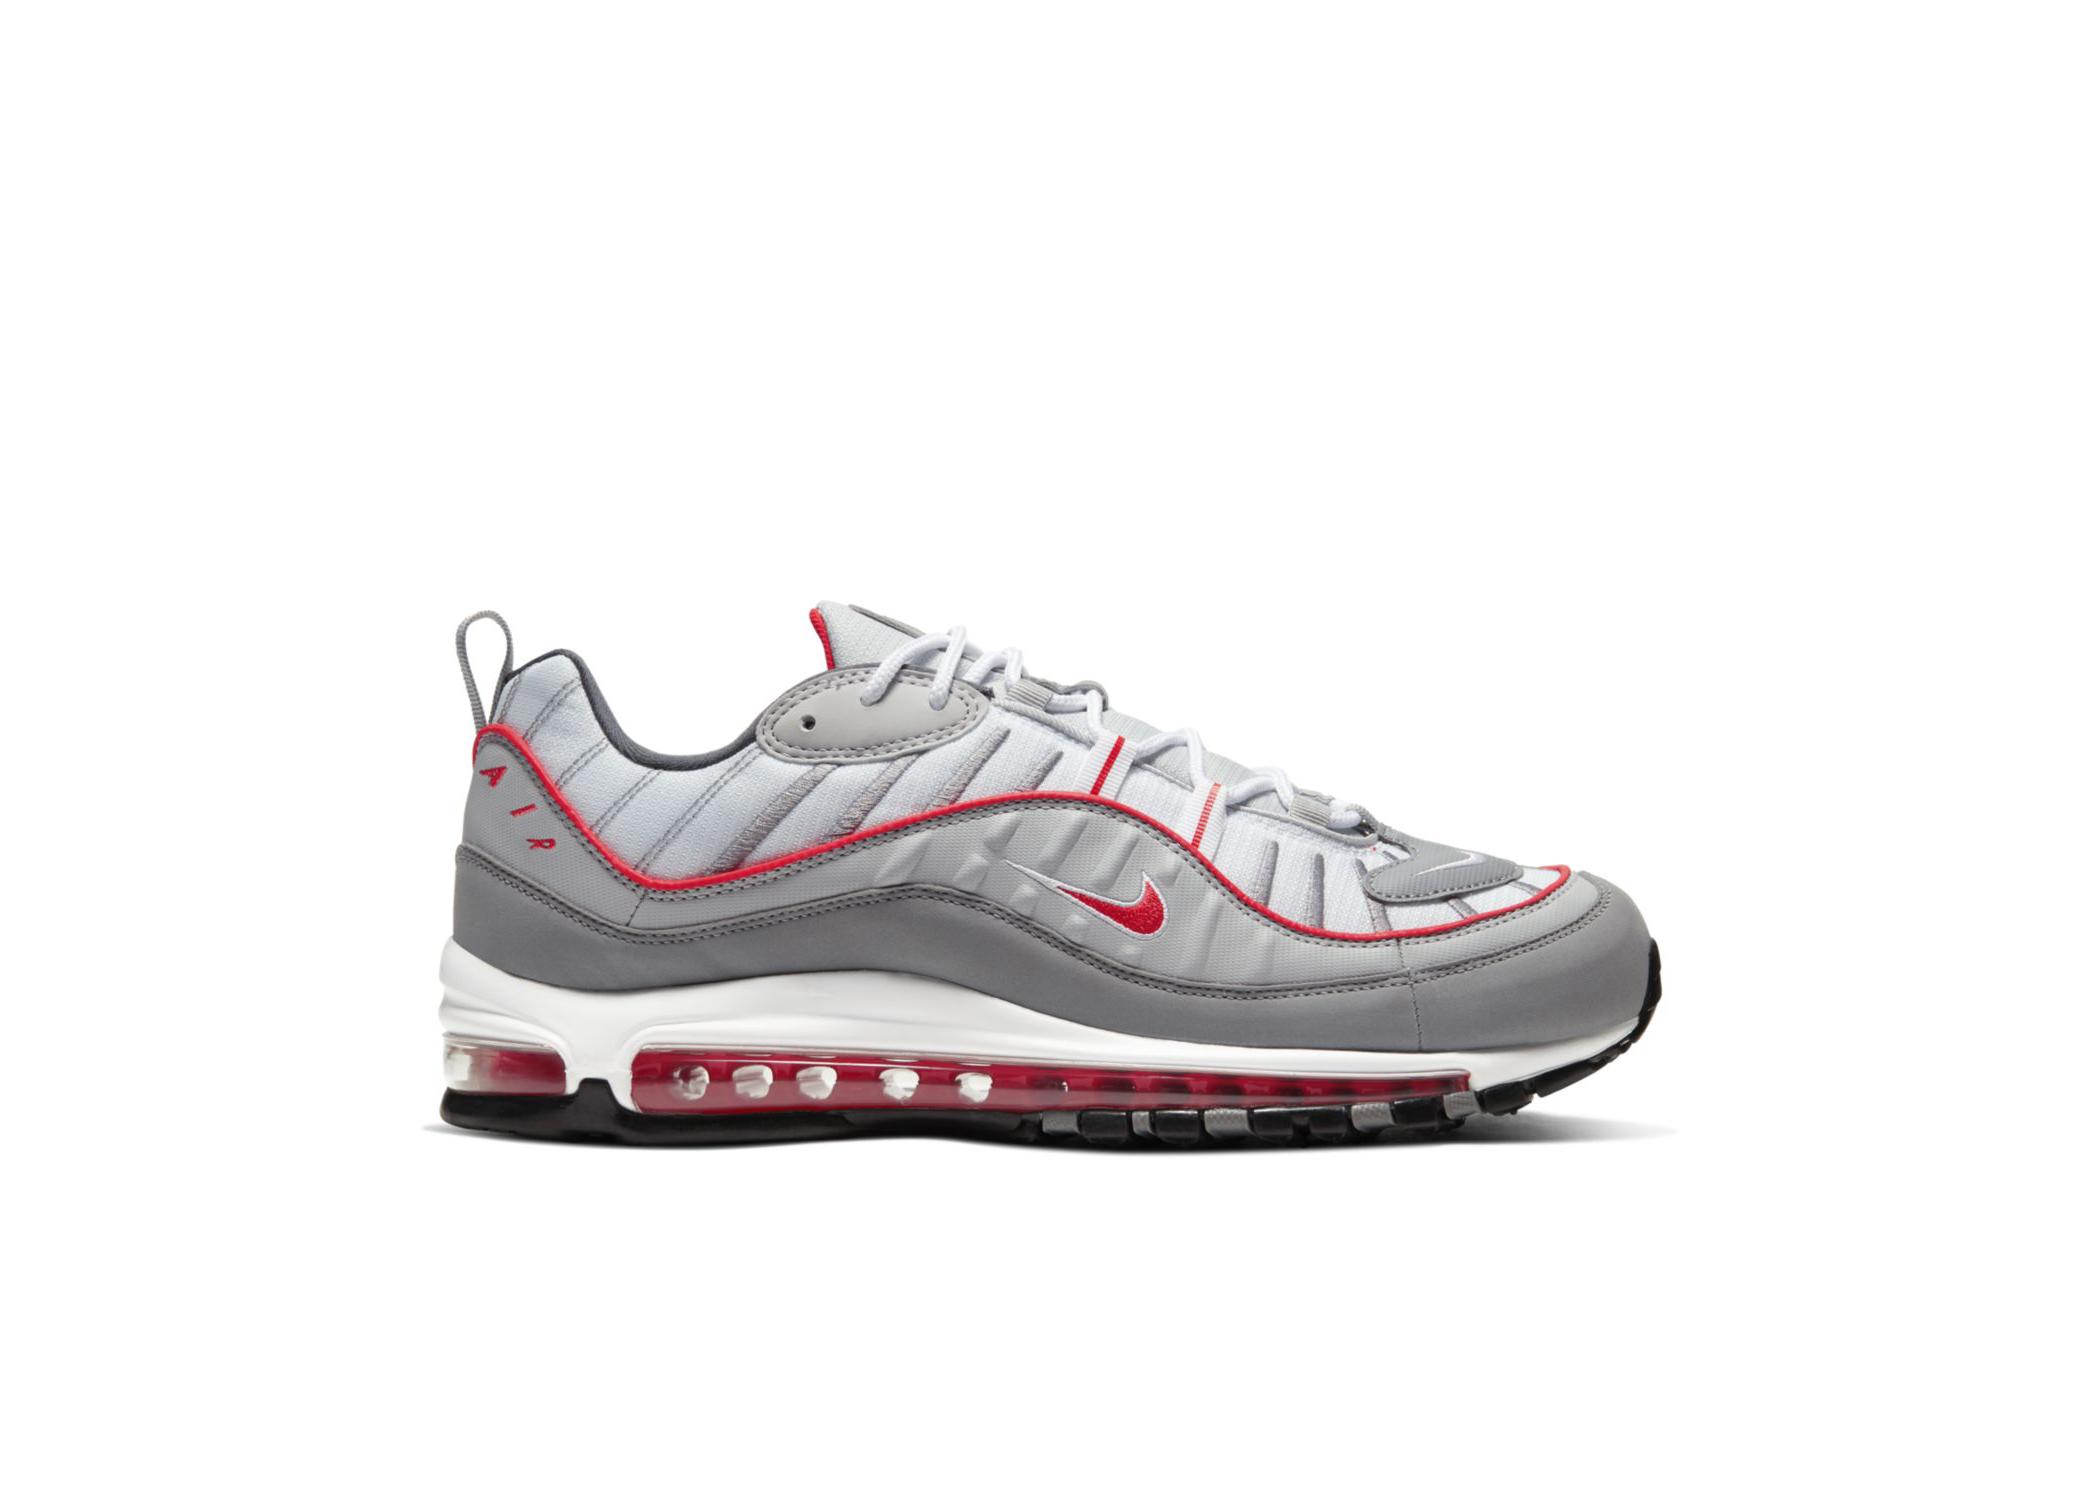 Acheter Nike Air Max 98 Chaussures et sneakers neuves